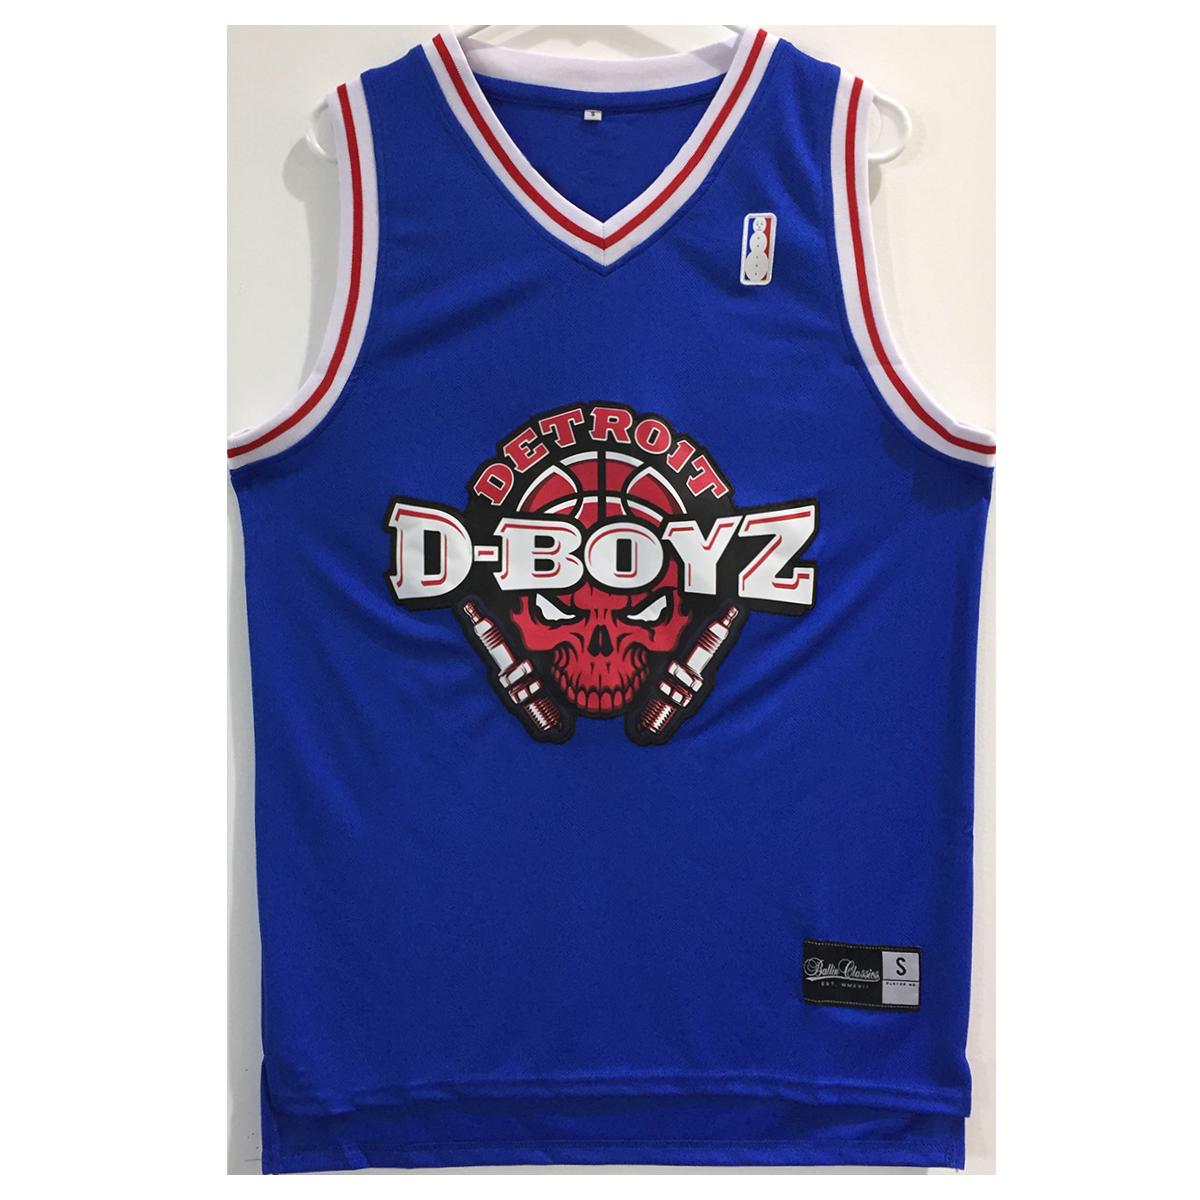 Detroit D-Boyz Jersey